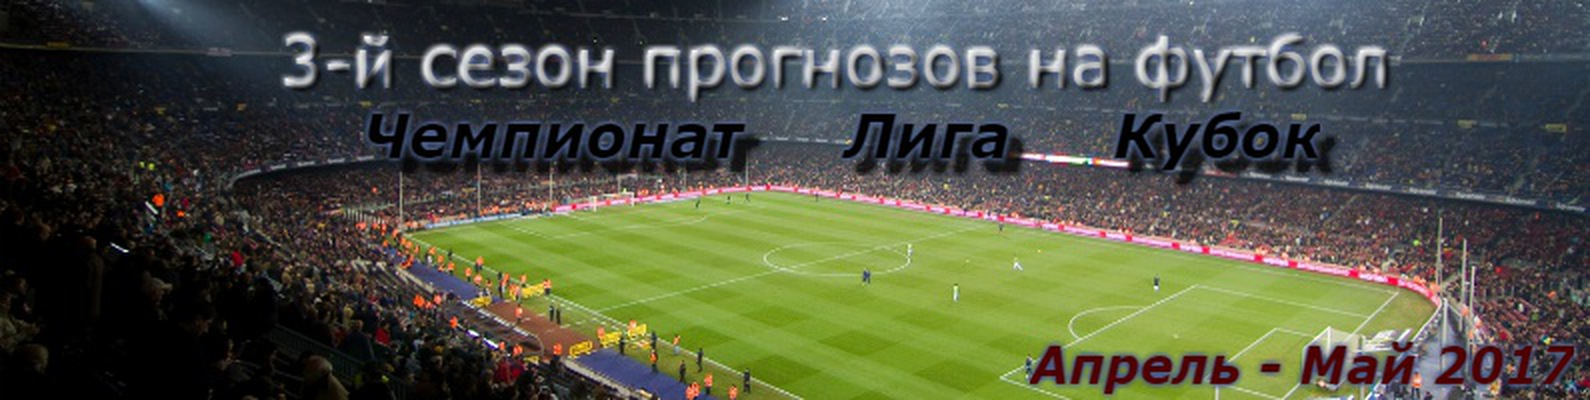 Прогнозы на сезон по футболу